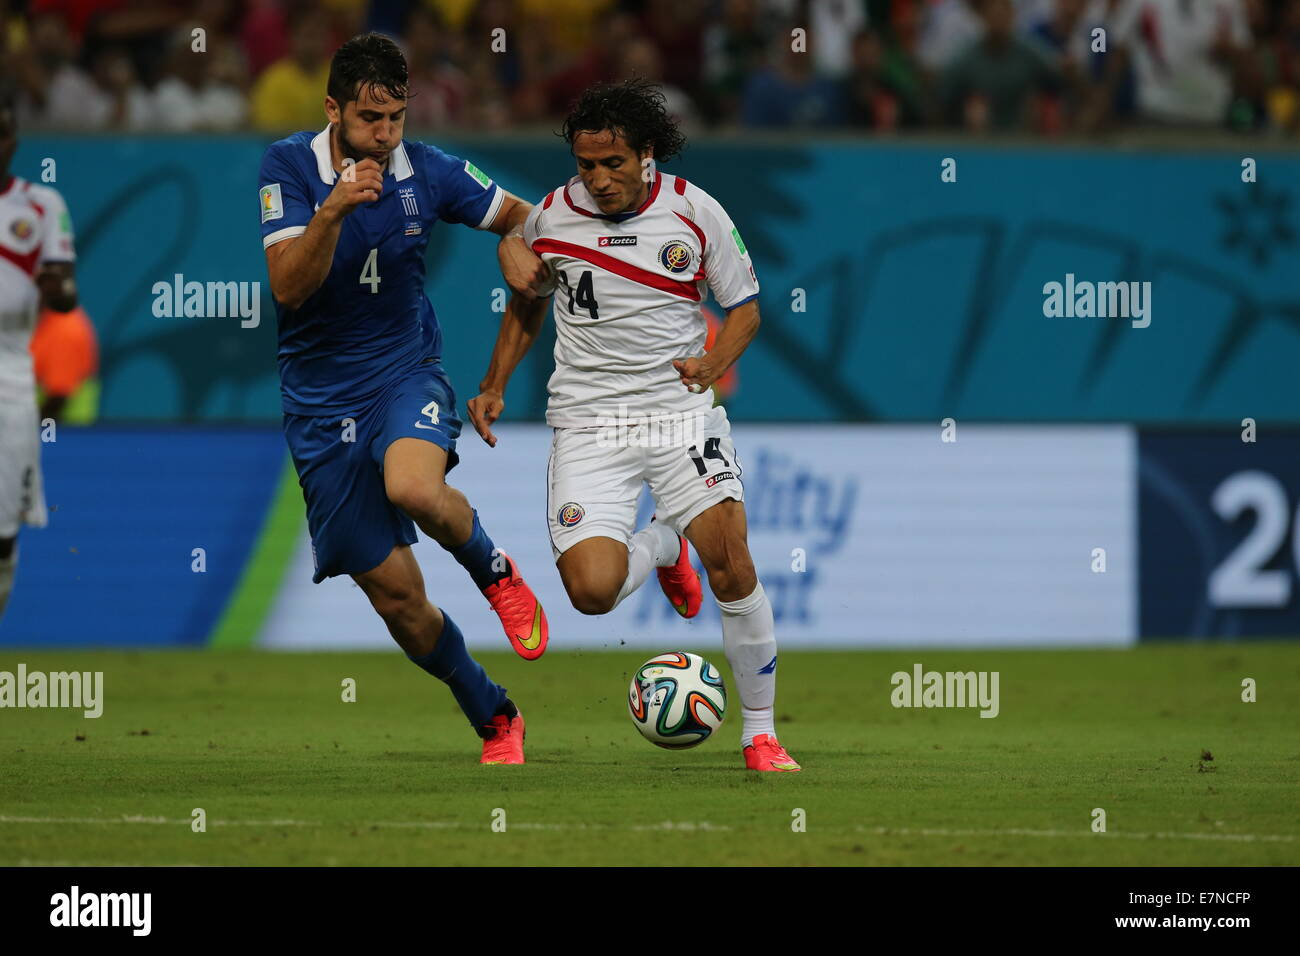 Konstantinos Manolas of Greece and Randall Brenes of Costa Rica. Greece v Costa Rica FIFA World Cup Brazil 2014. - Stock Image